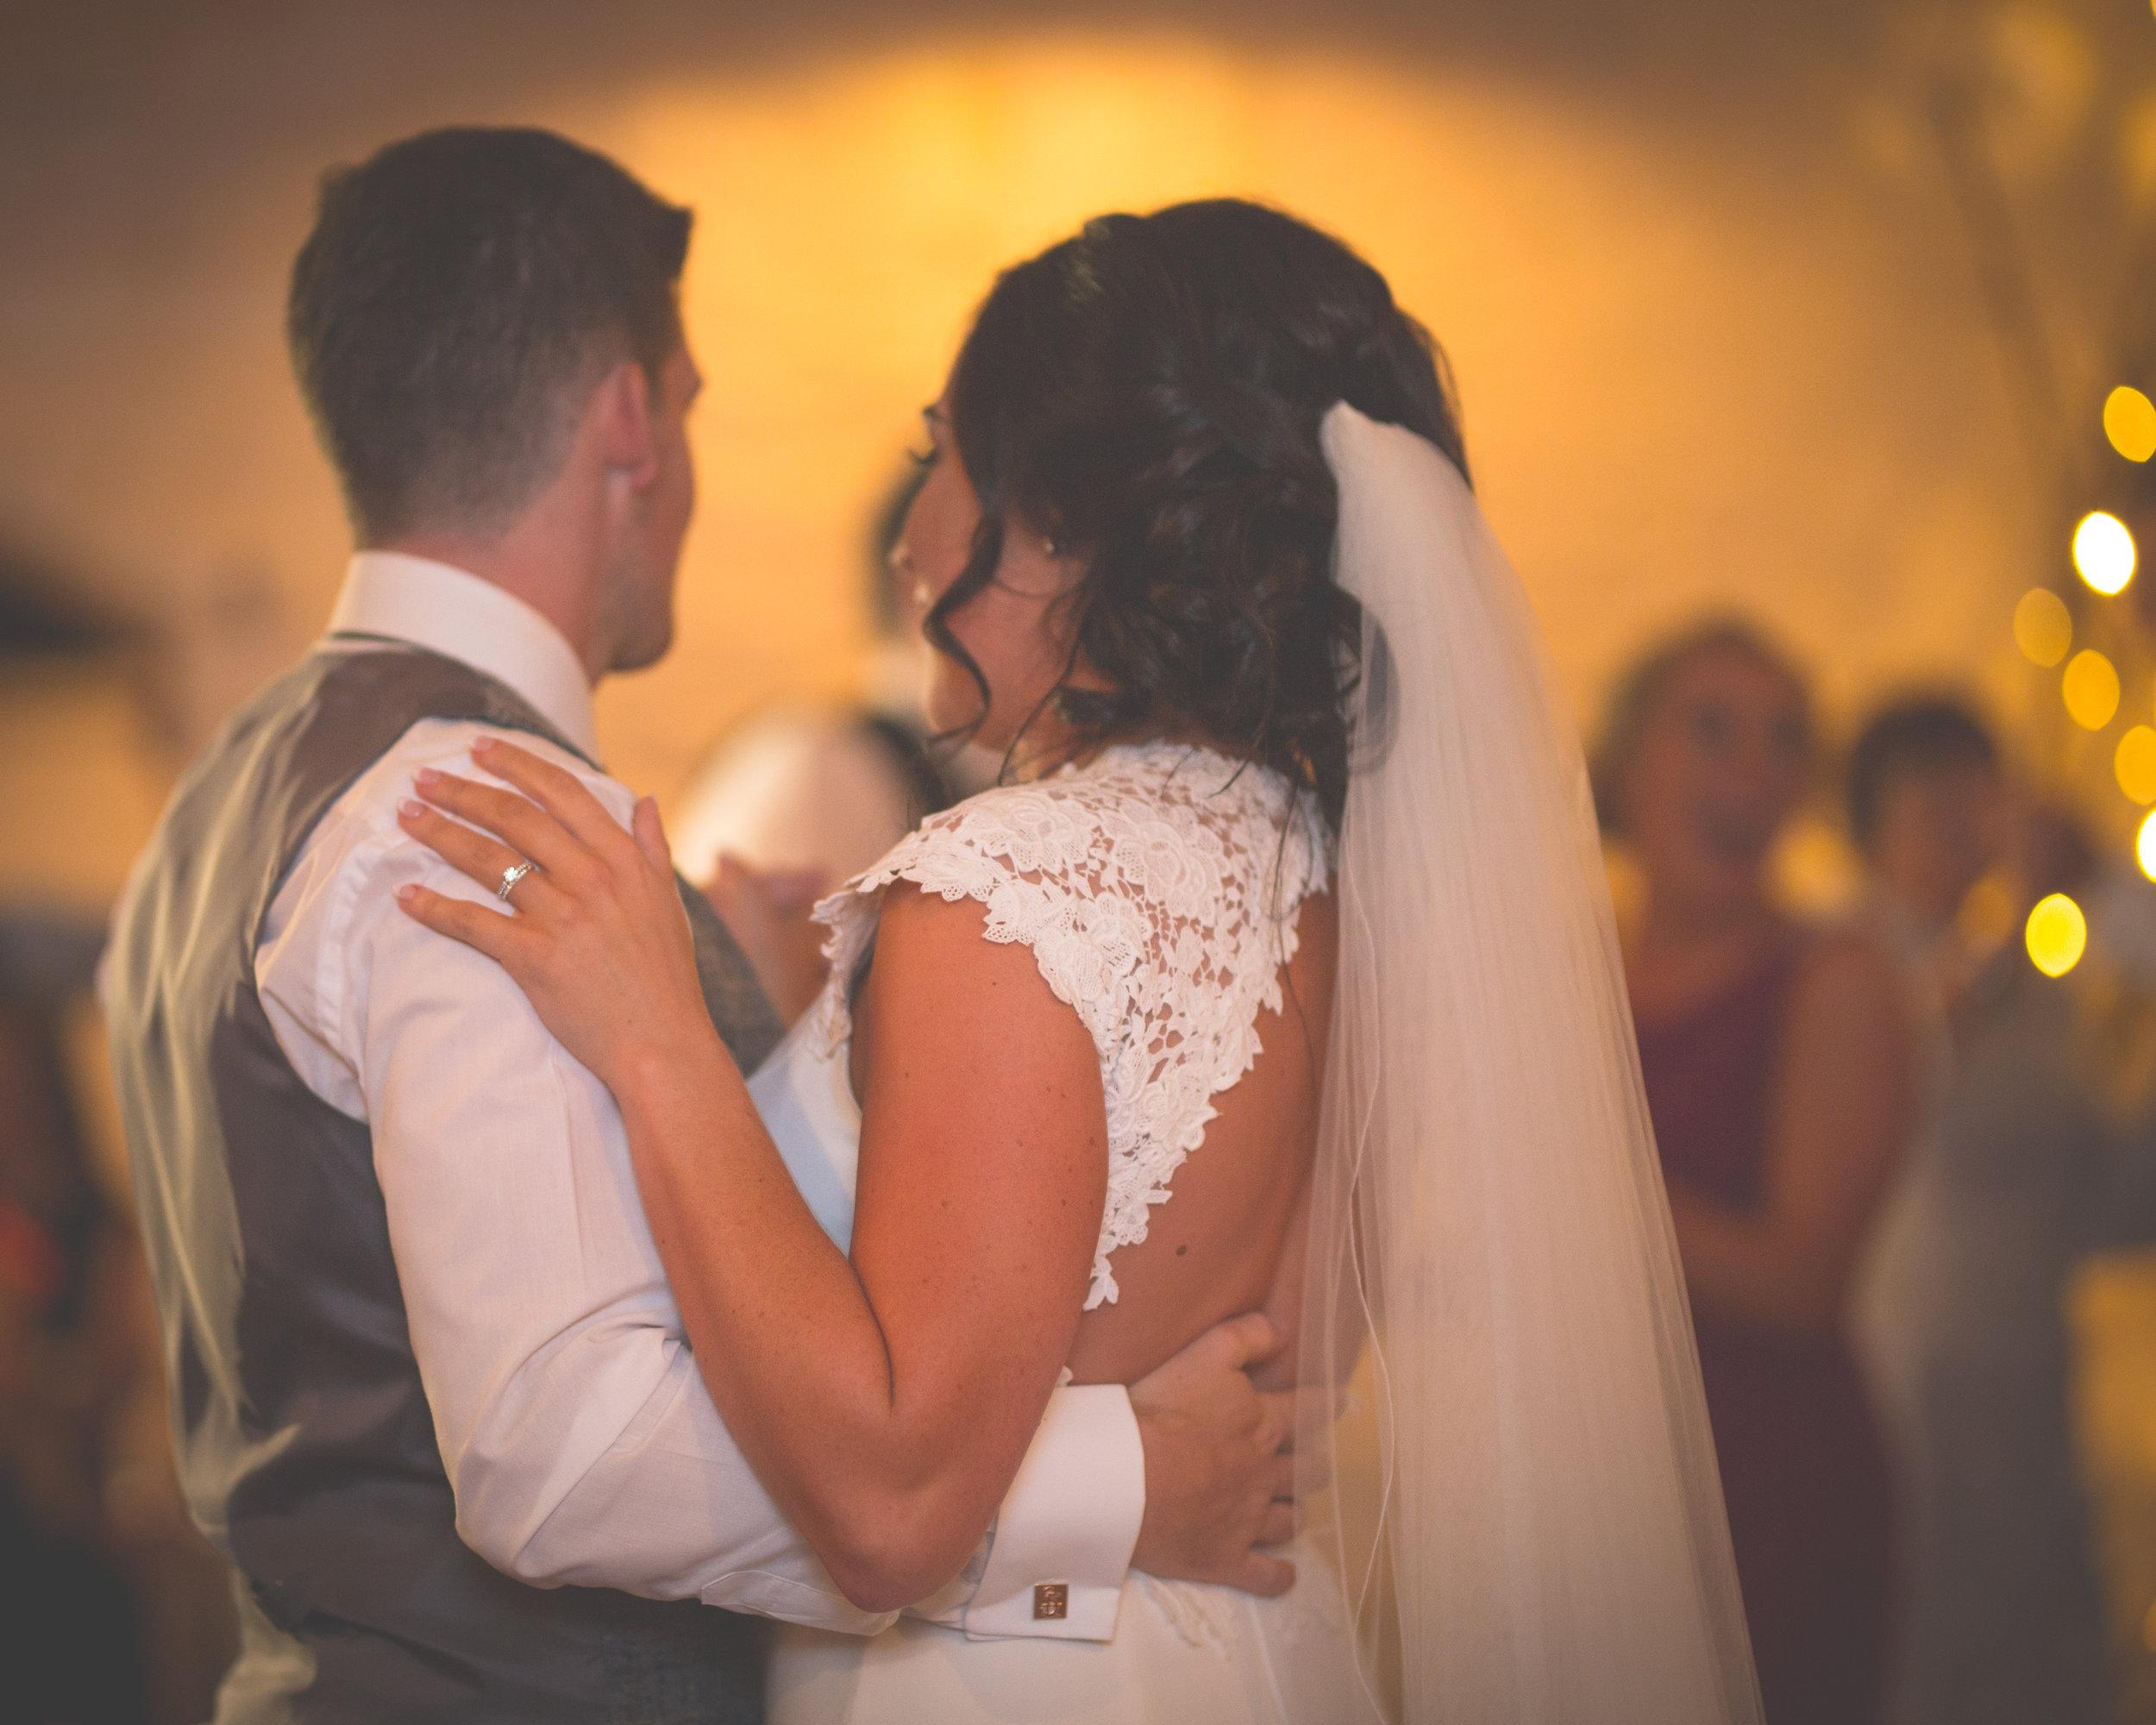 Brian McEwan Wedding Photography | Carol-Annee & Sean | The Dancing-42.jpg